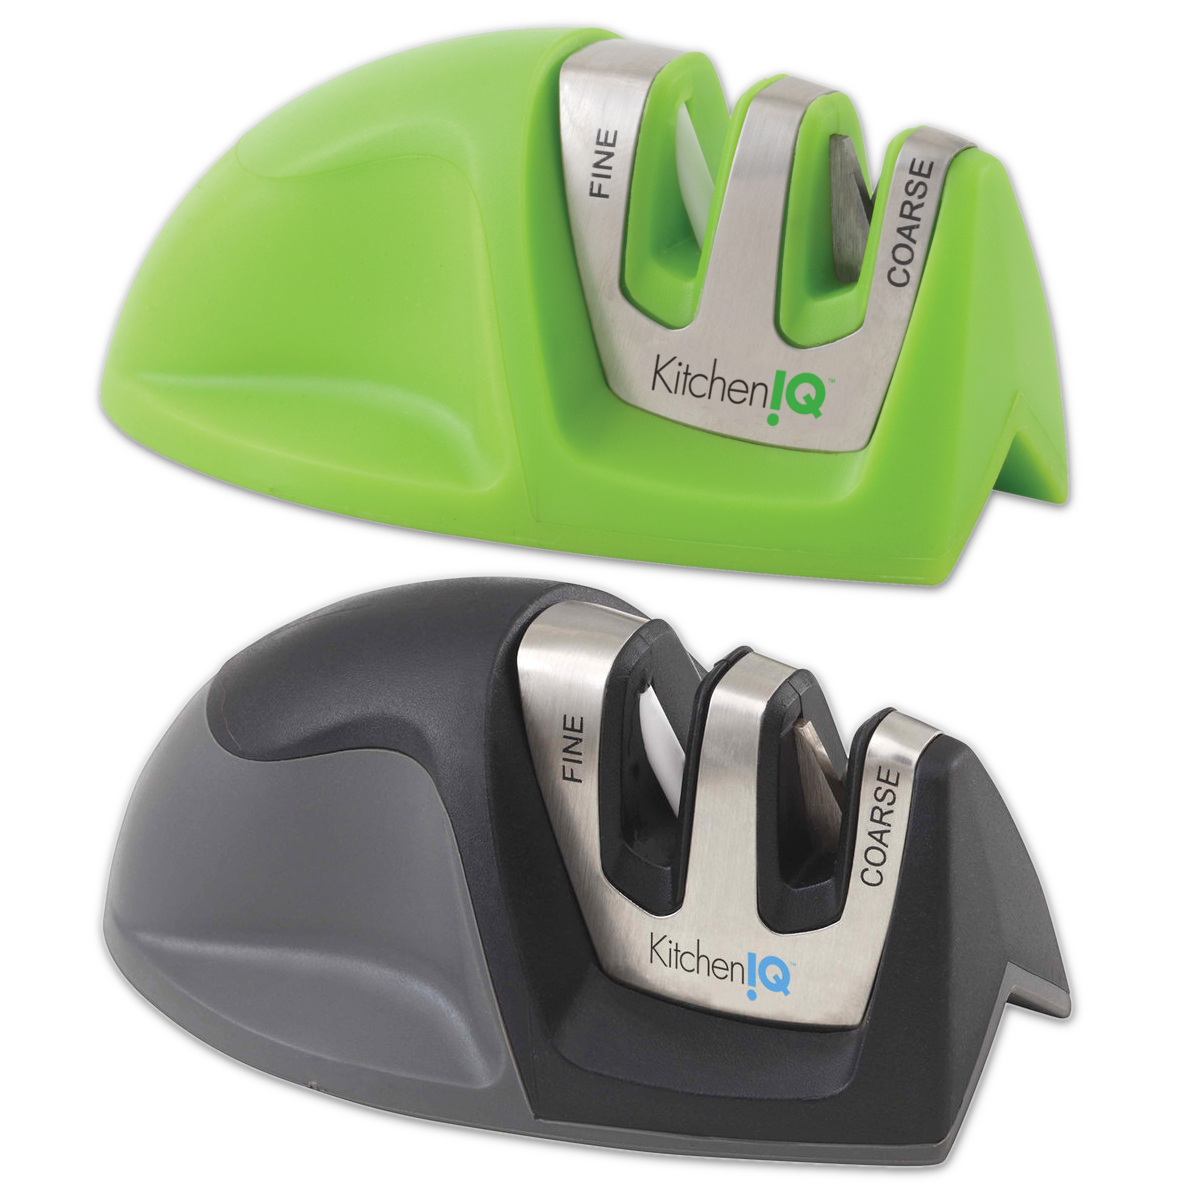 Kitchen IQ Edge Grip 2-Stage Green and Black Knife Sharpener, Set of 2